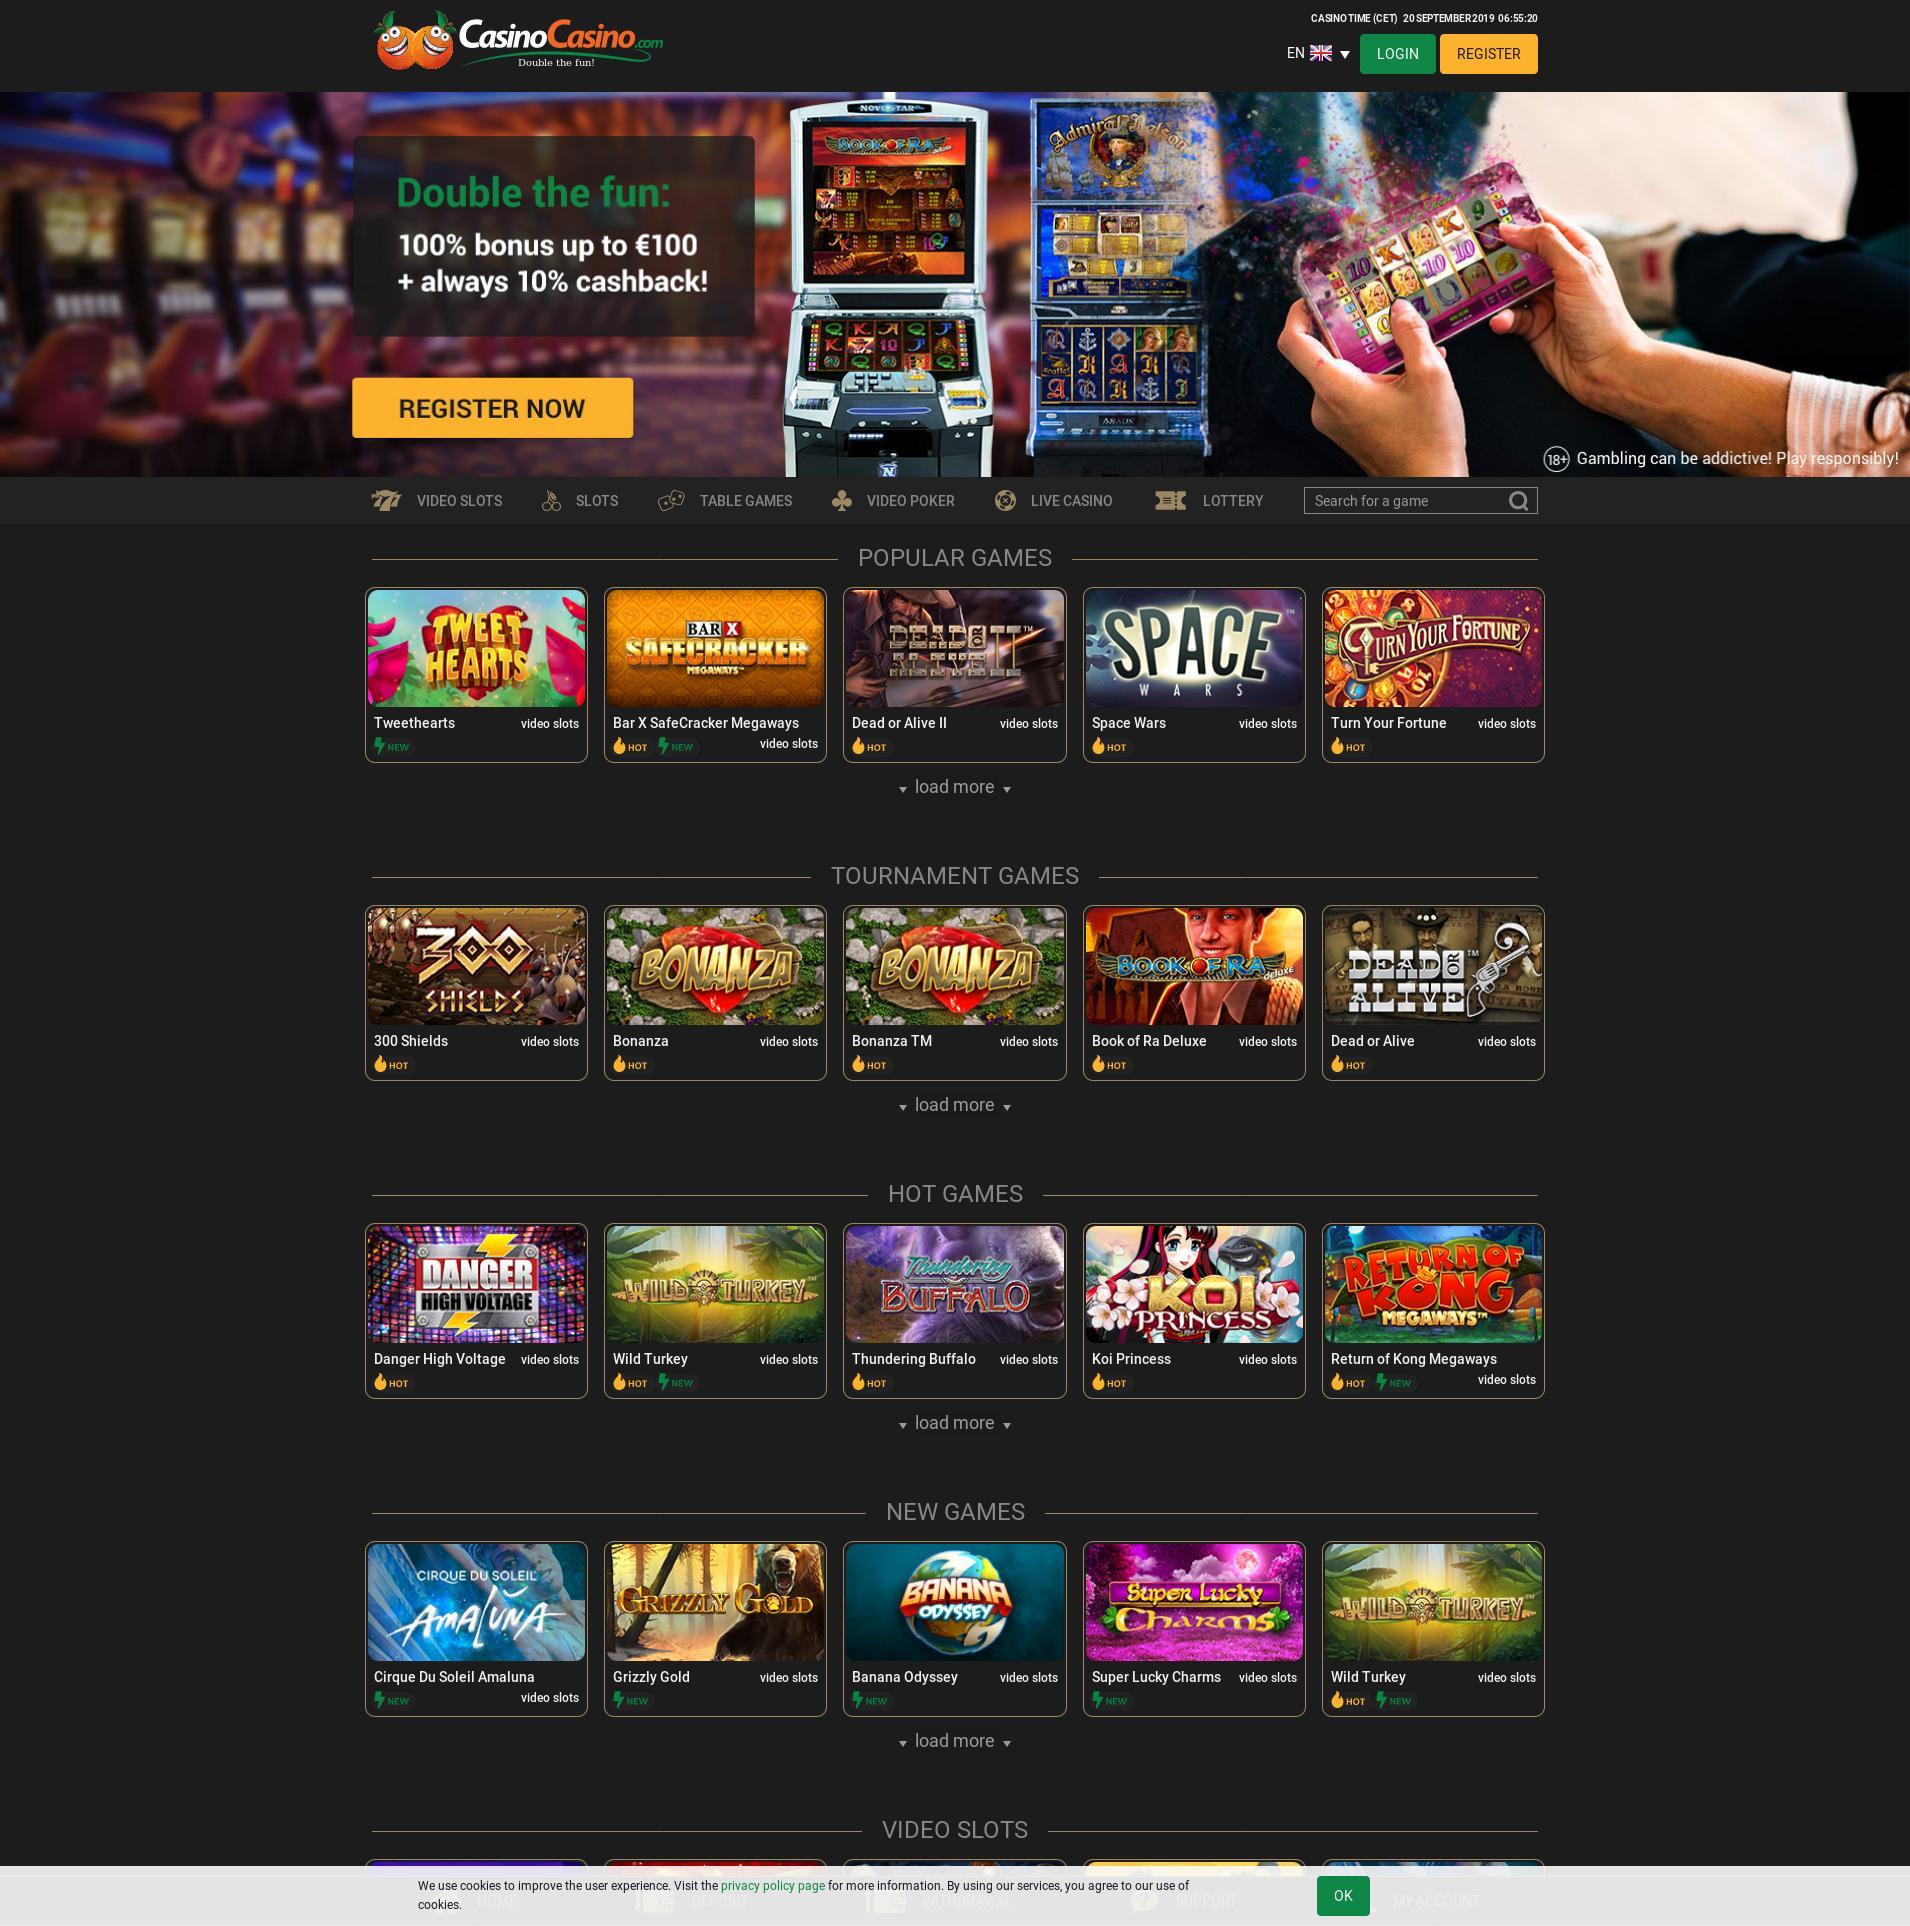 Casino skärm Lobby 2019-09-20 för Norge